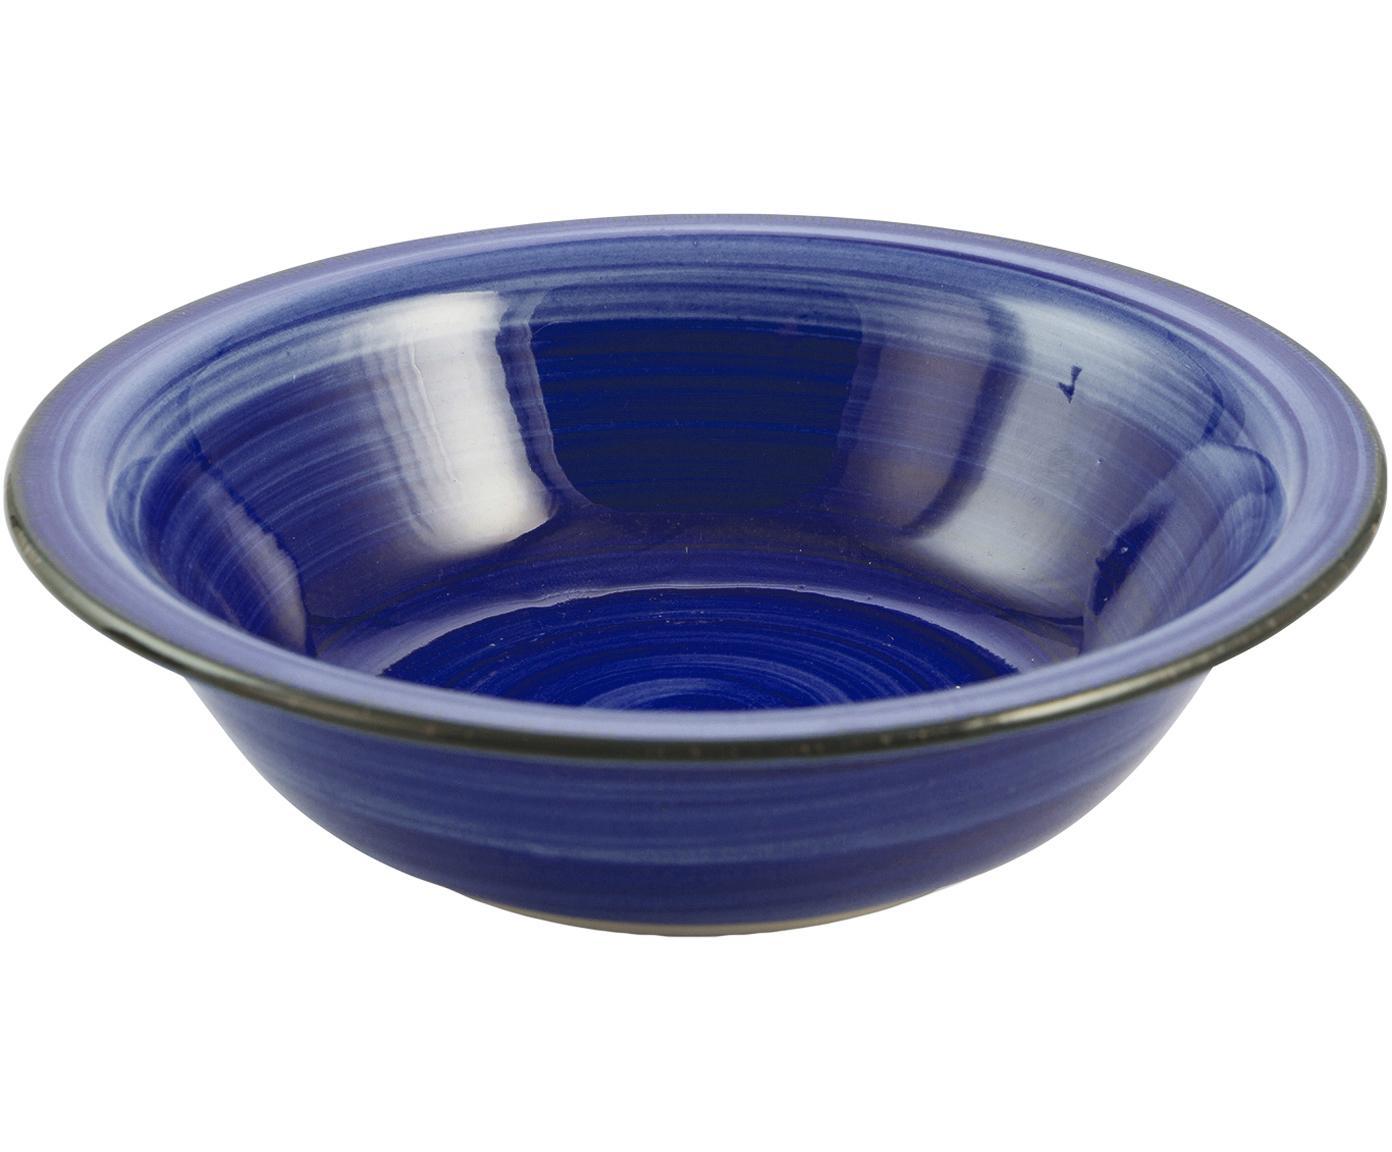 Suppenteller Baita, 6 Stück, Steingut (Hard Dolomite), handbemalt, Blau, Ø 22 cm